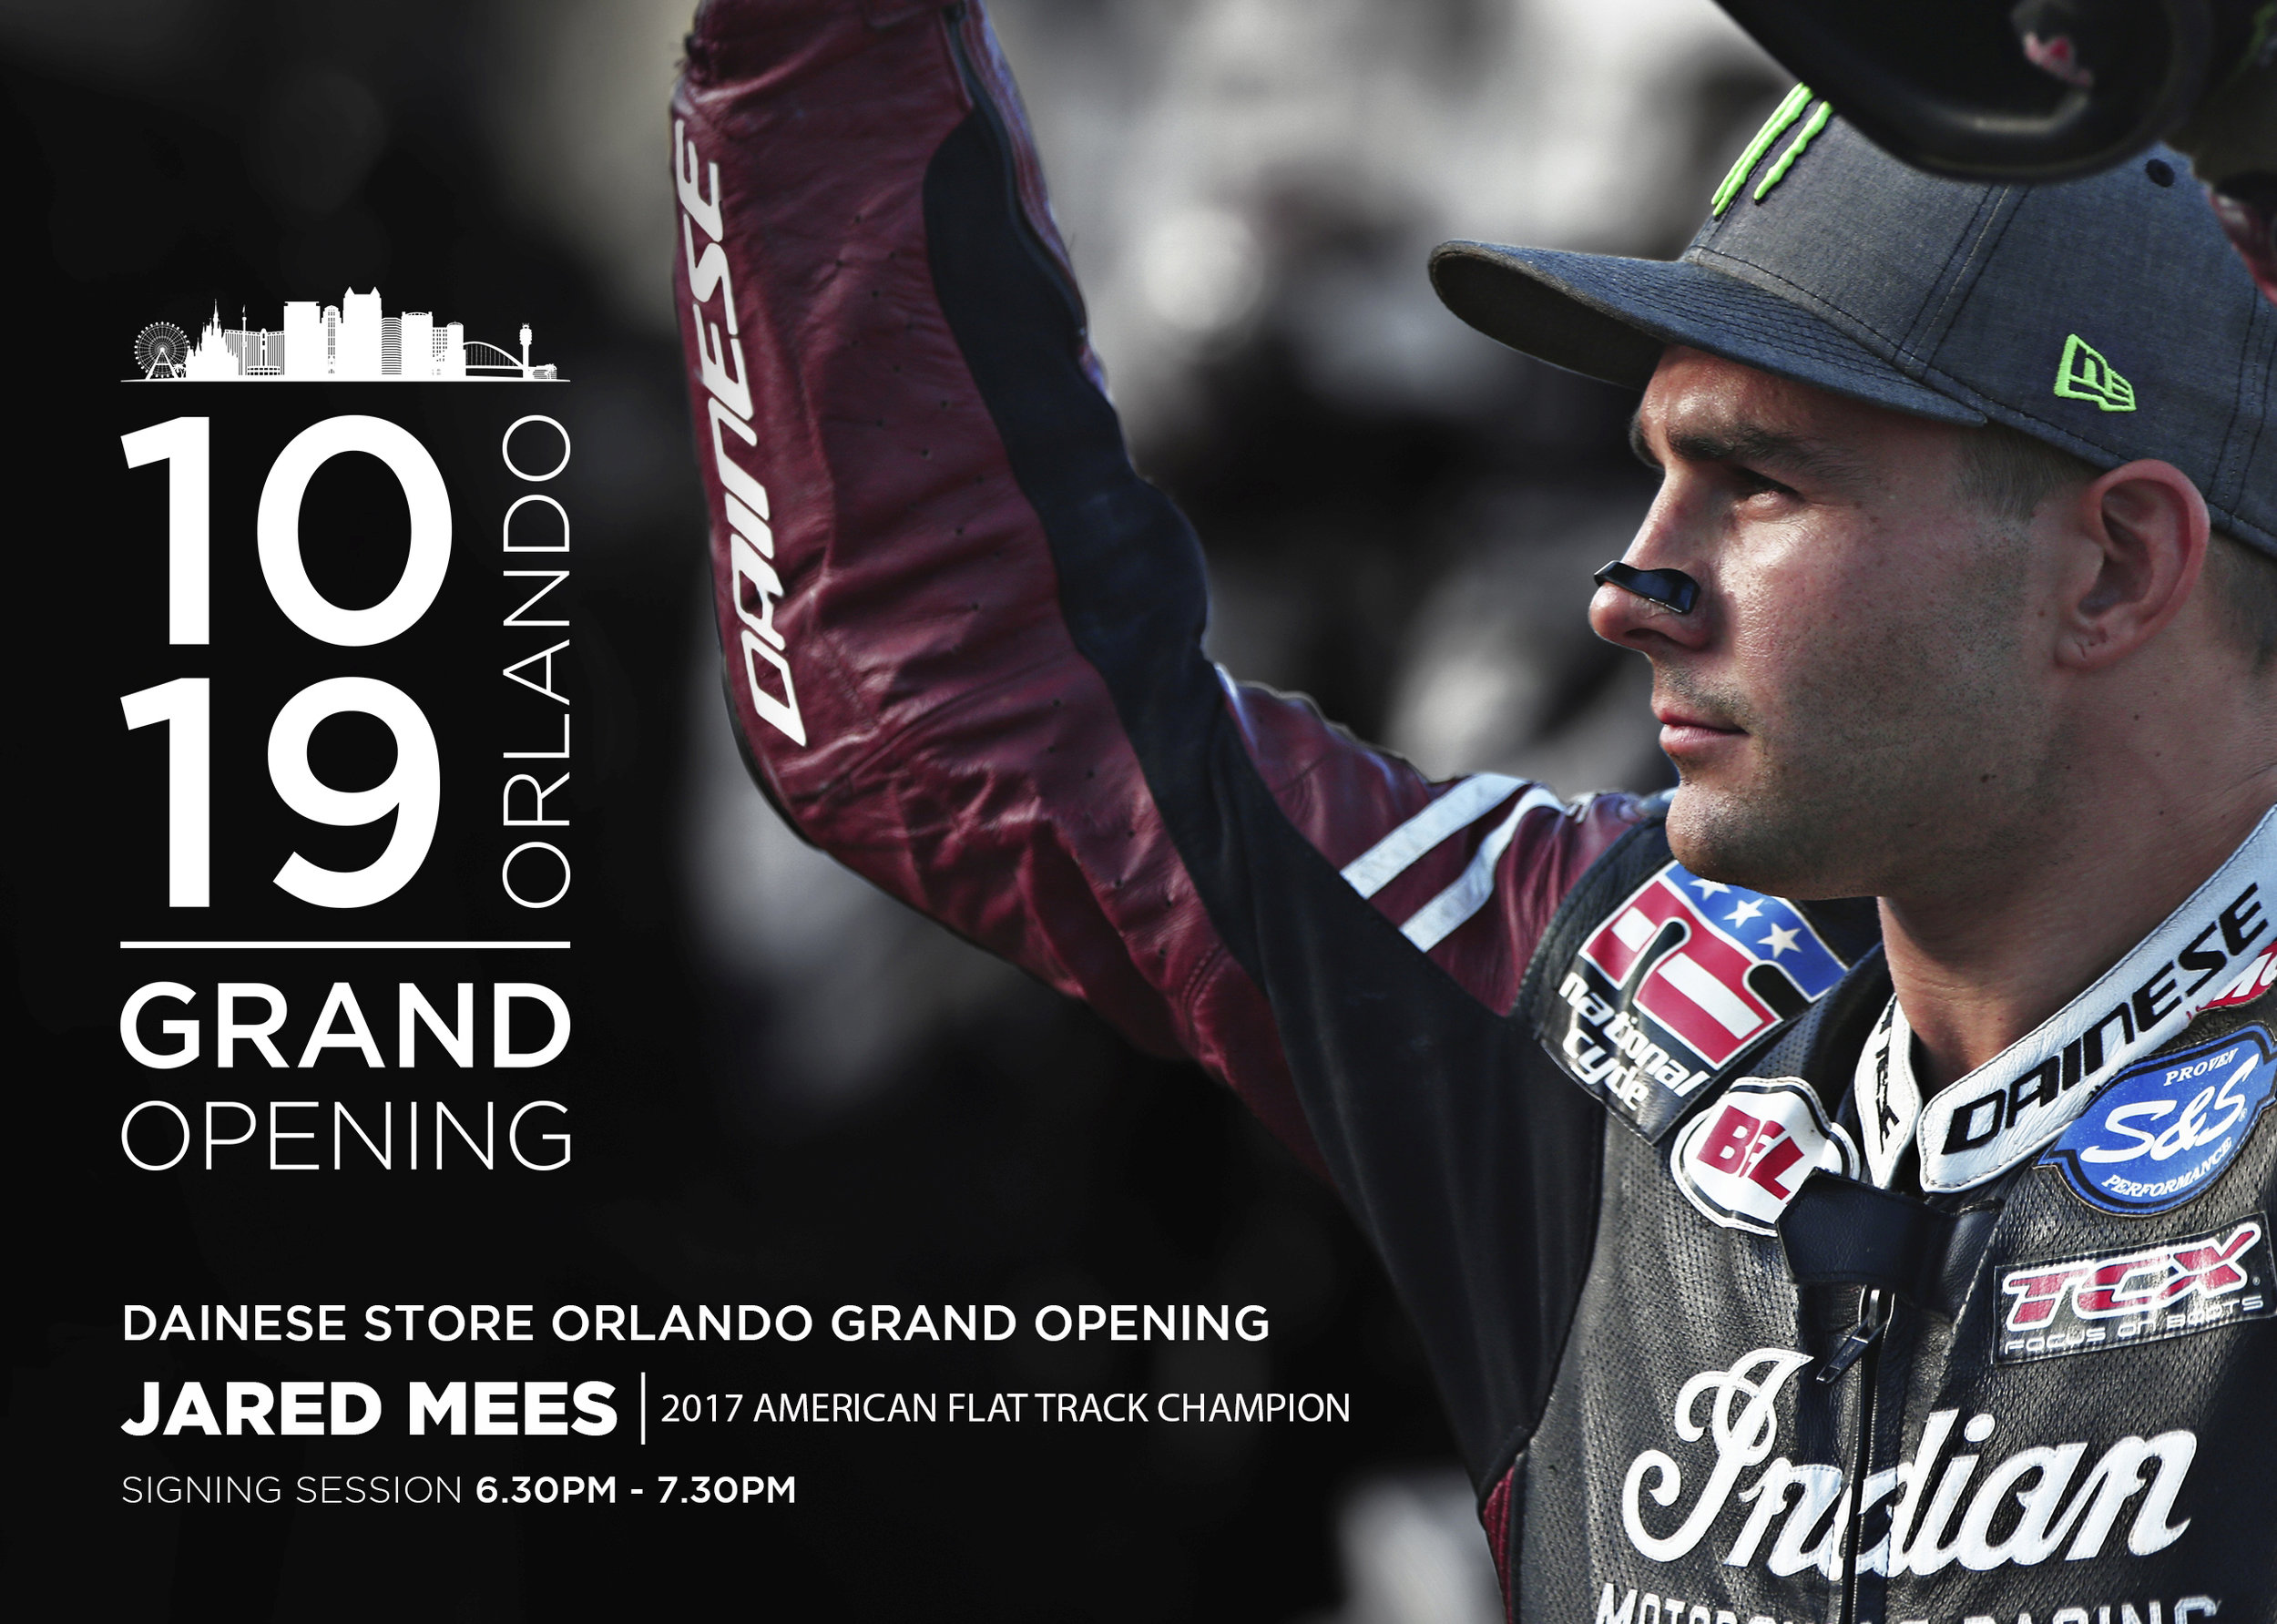 POST_FACEBOOK_OPENING_D-Store_JARED-MEES_ORLANDO NEW.jpg